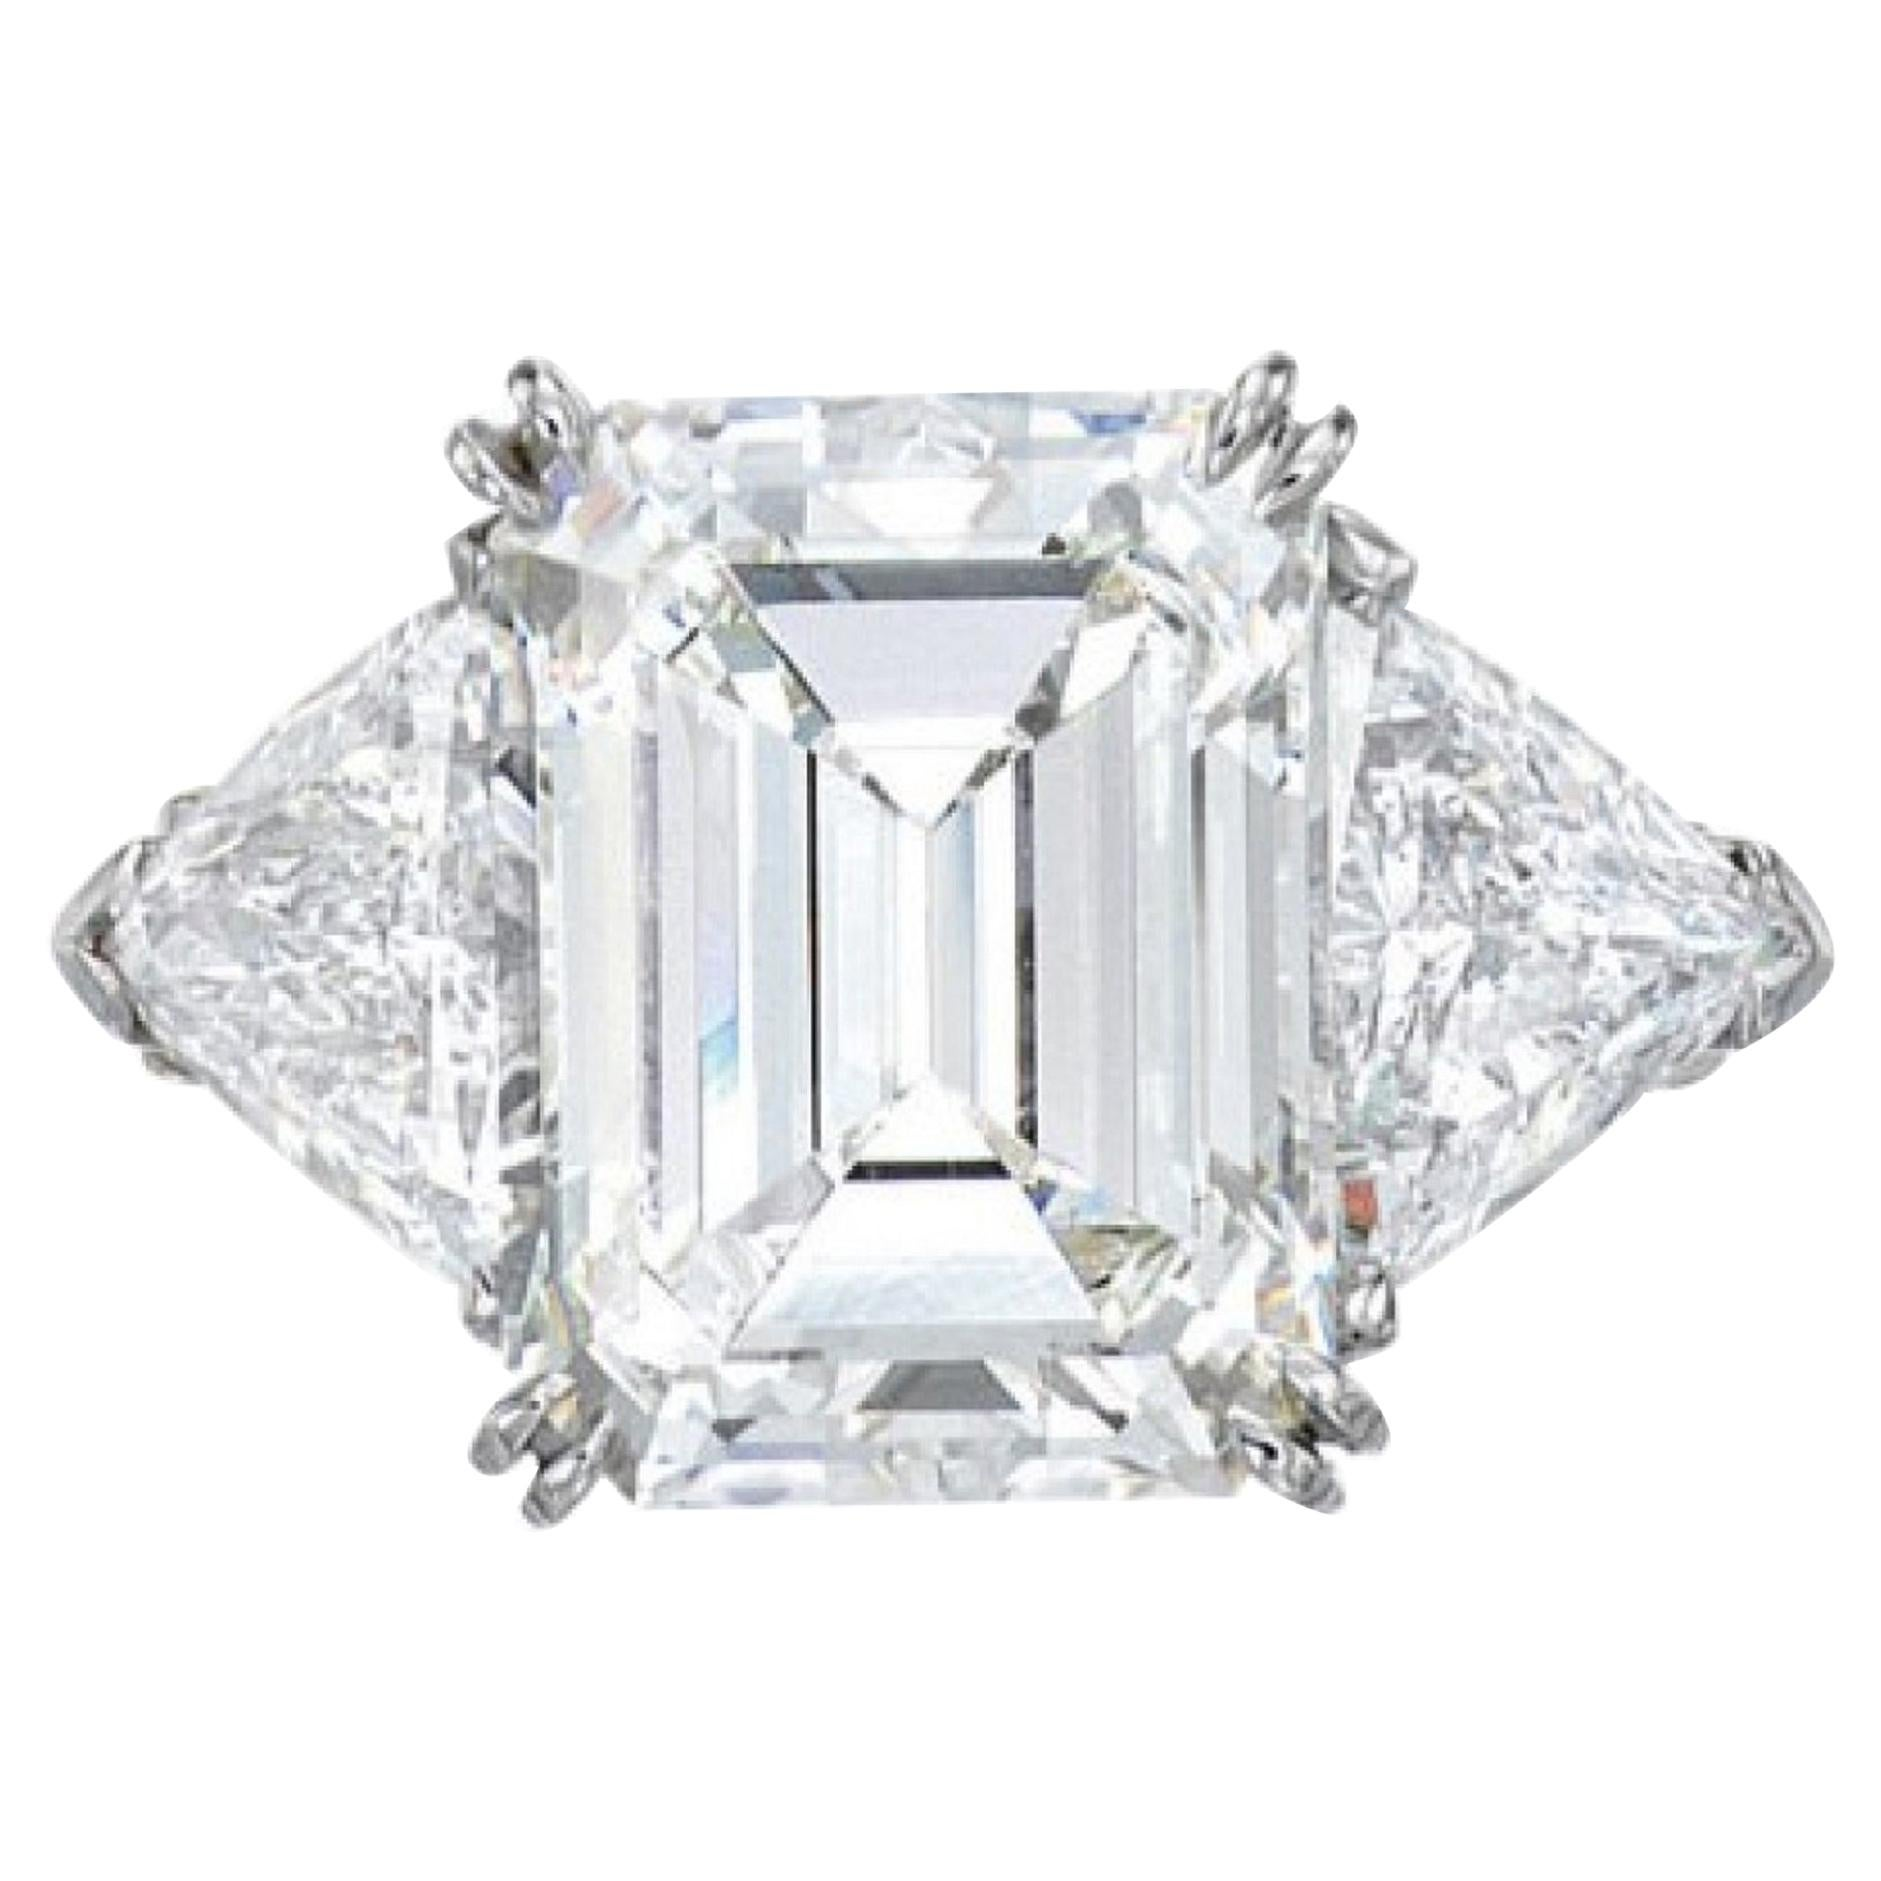 IGI Certified 3 Carat Emerald Cut Diamond Ring